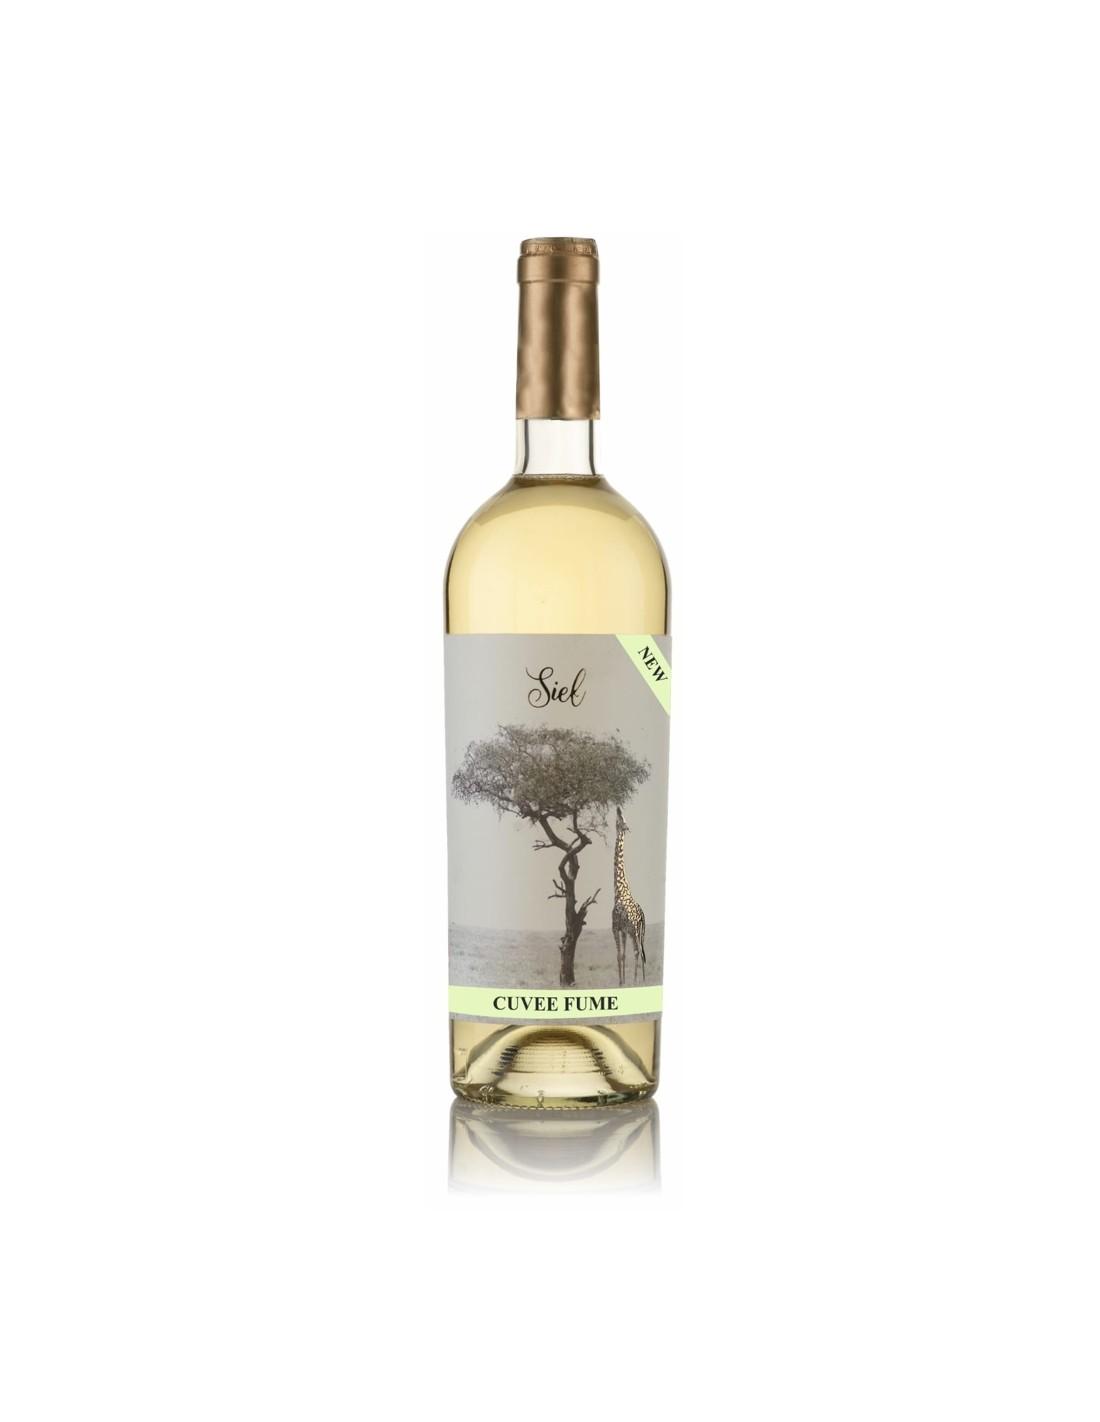 Vin alb demisec, Cupaj, Siel Cuvee Fume, Dealu Mare, 0.75L, 12% alc., Romania